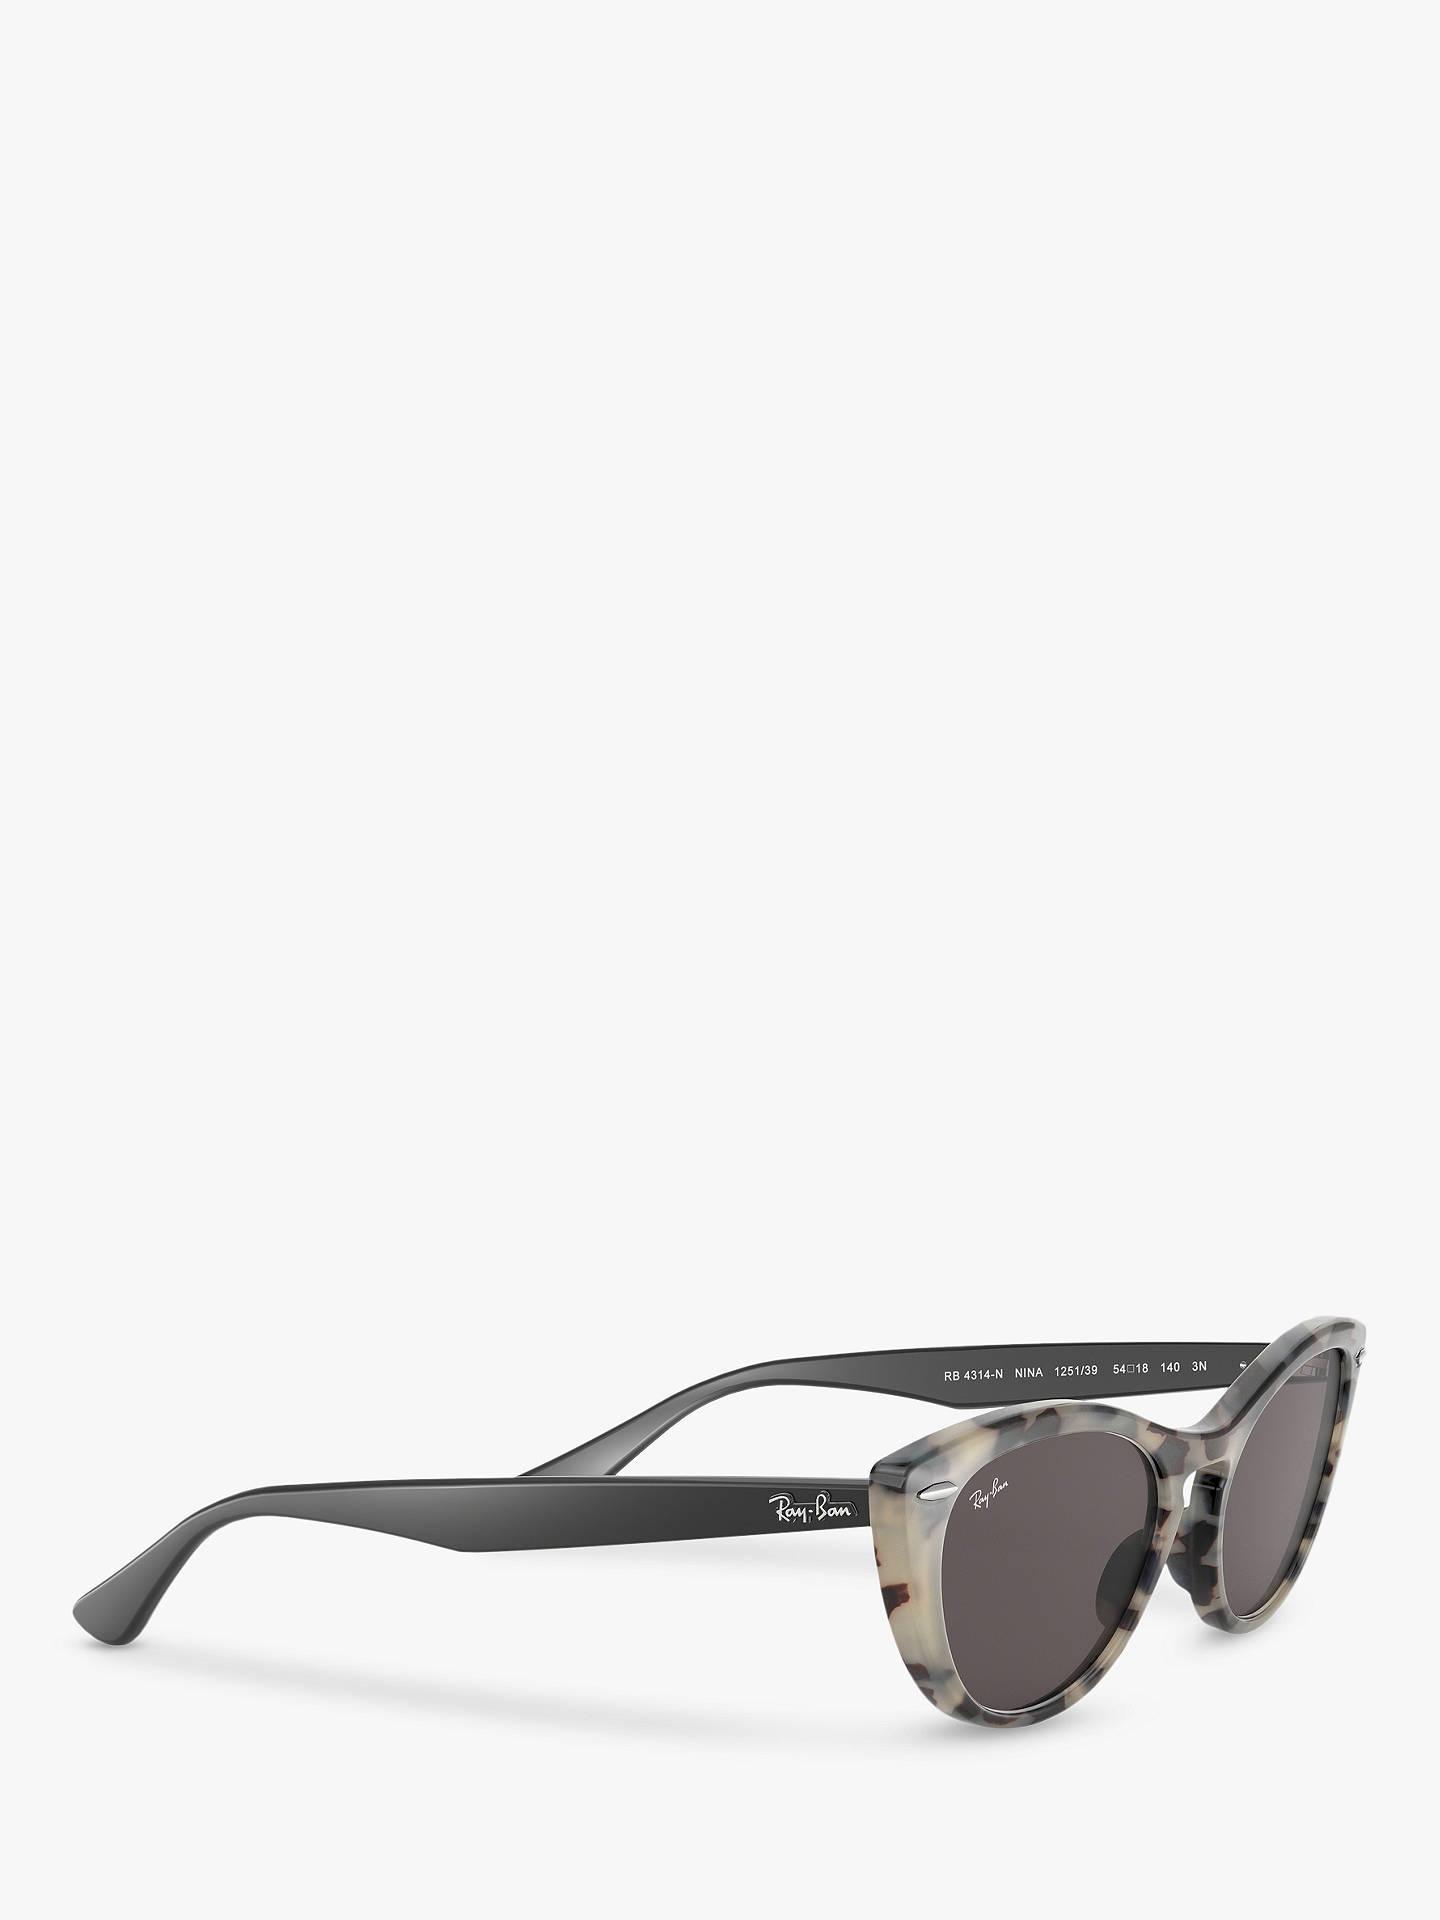 2331dd9ba617 Buy Ray-Ban RB4314N Women's Cat's Eye Sunglasses, Havana Beige Online at  johnlewis.